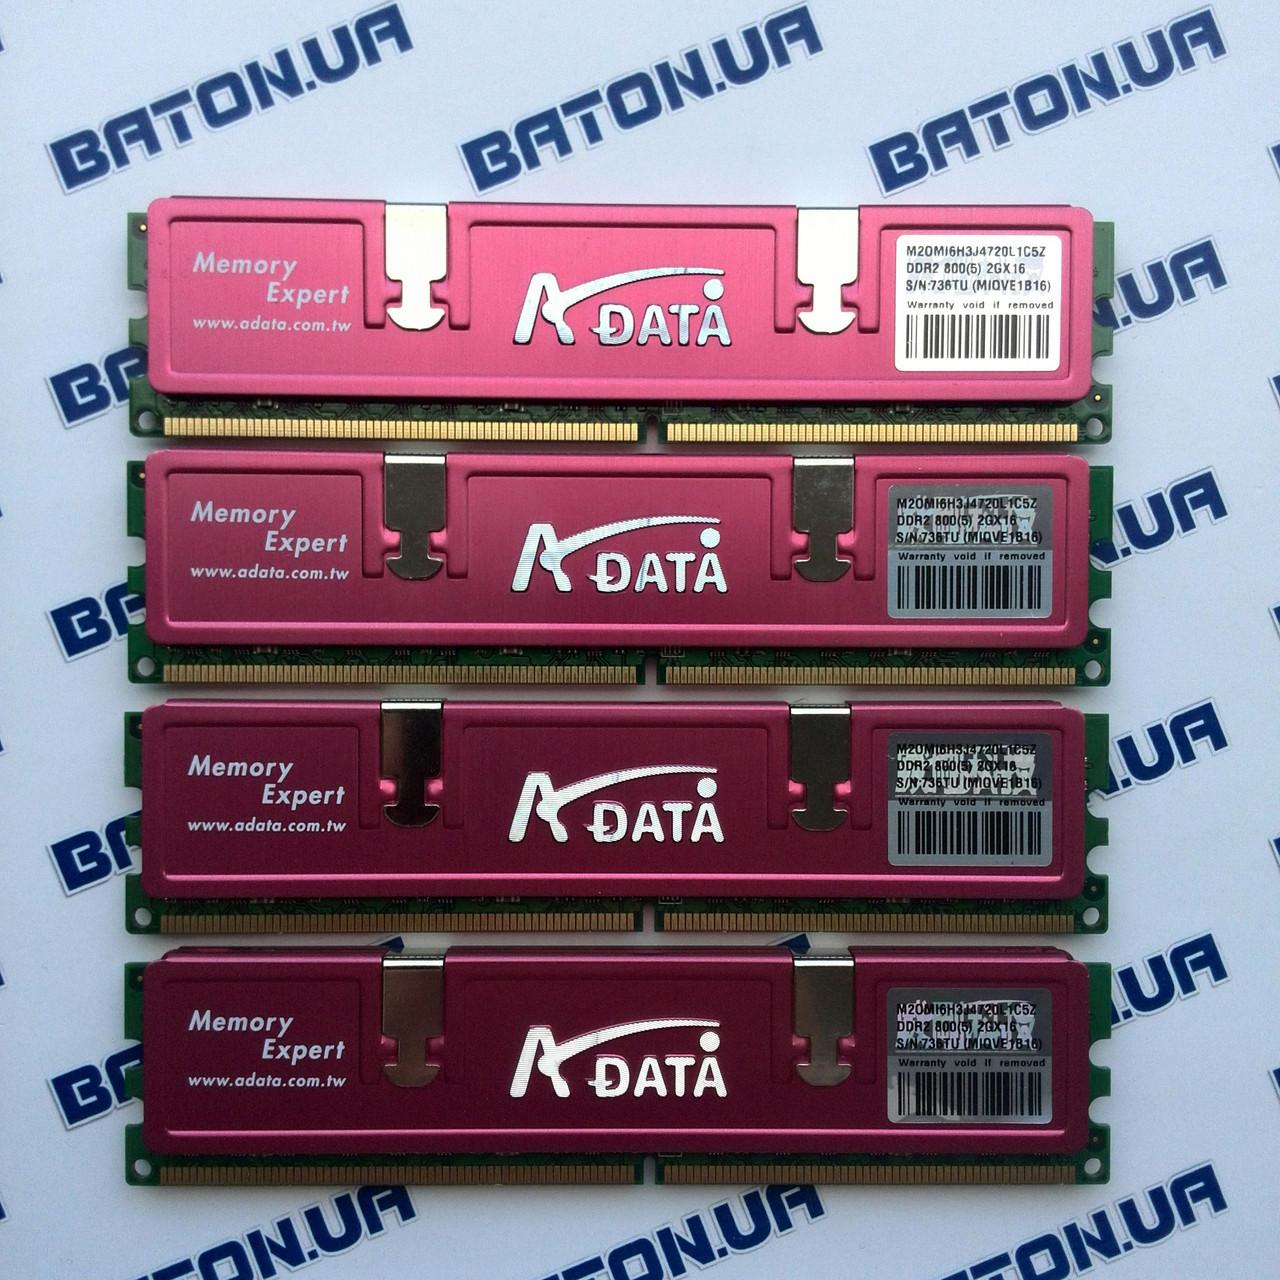 Комплект игровой оперативной памяти Adata DDR2 8Gb 4*2Gb 800MHz PC2 6400U CL5 (MIQVE1B16)